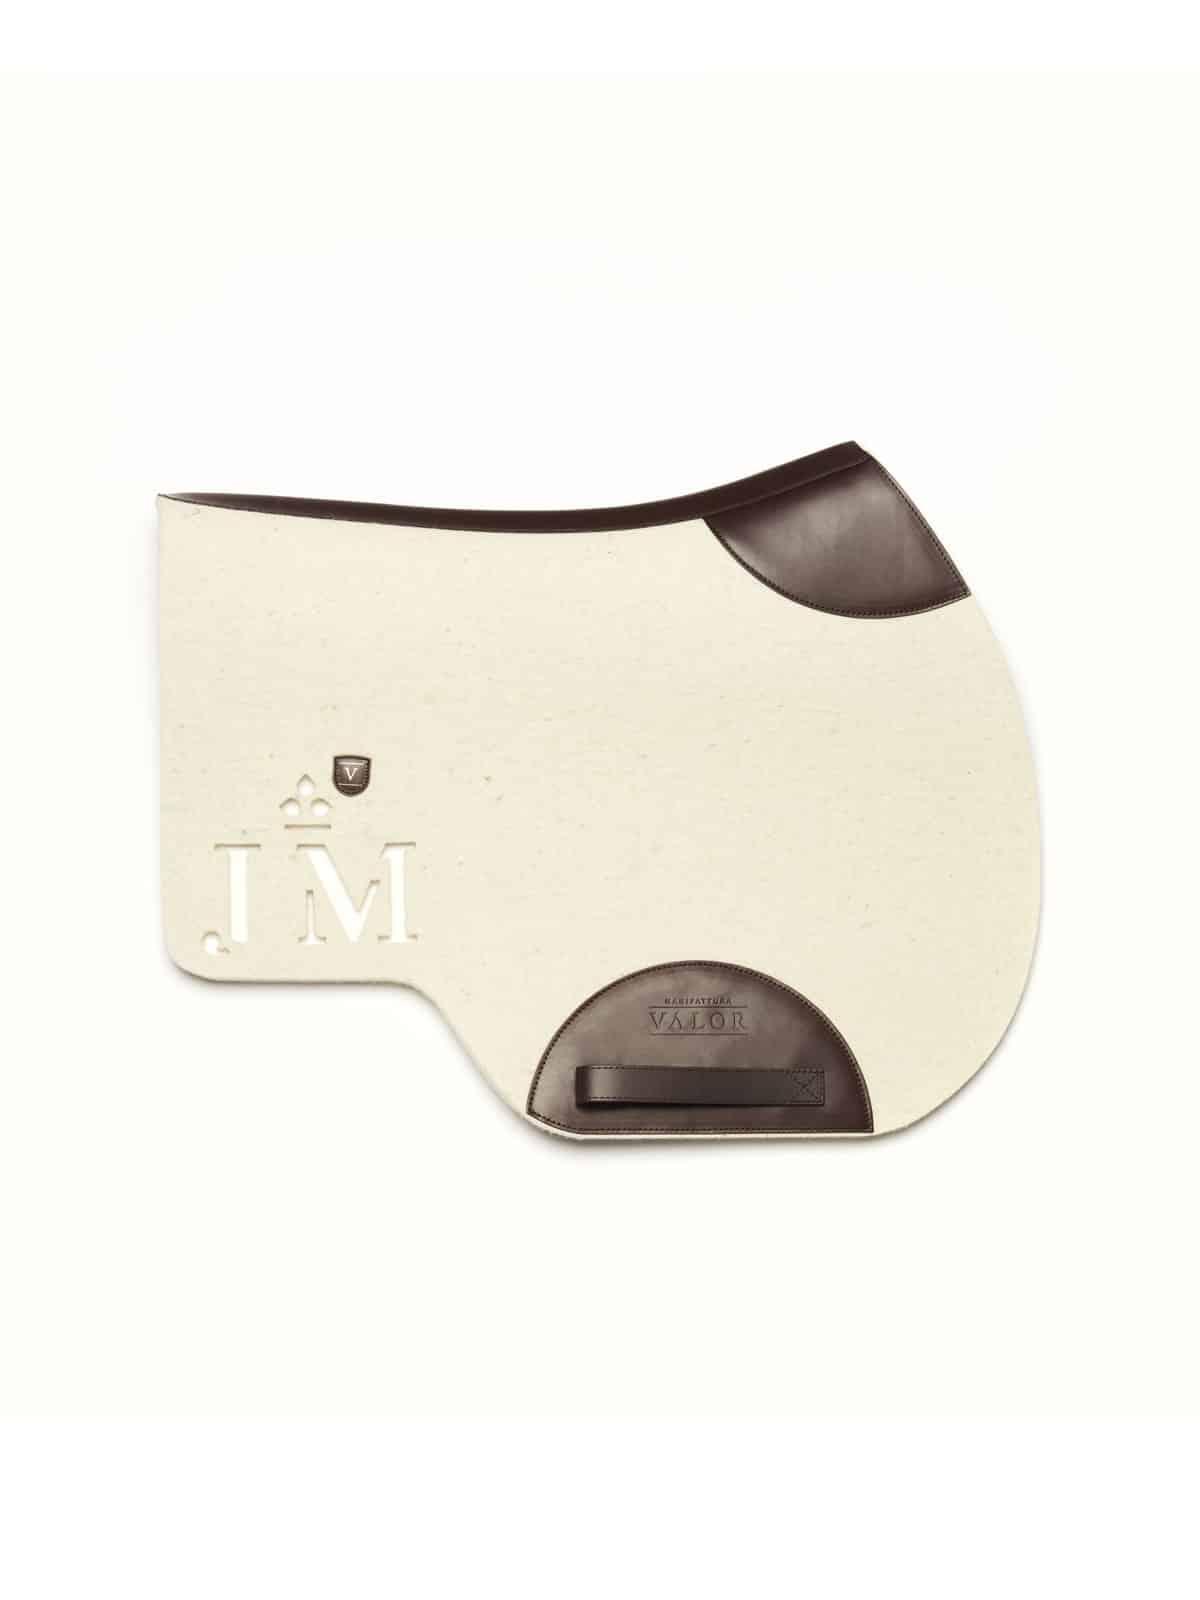 personalised saddle pads